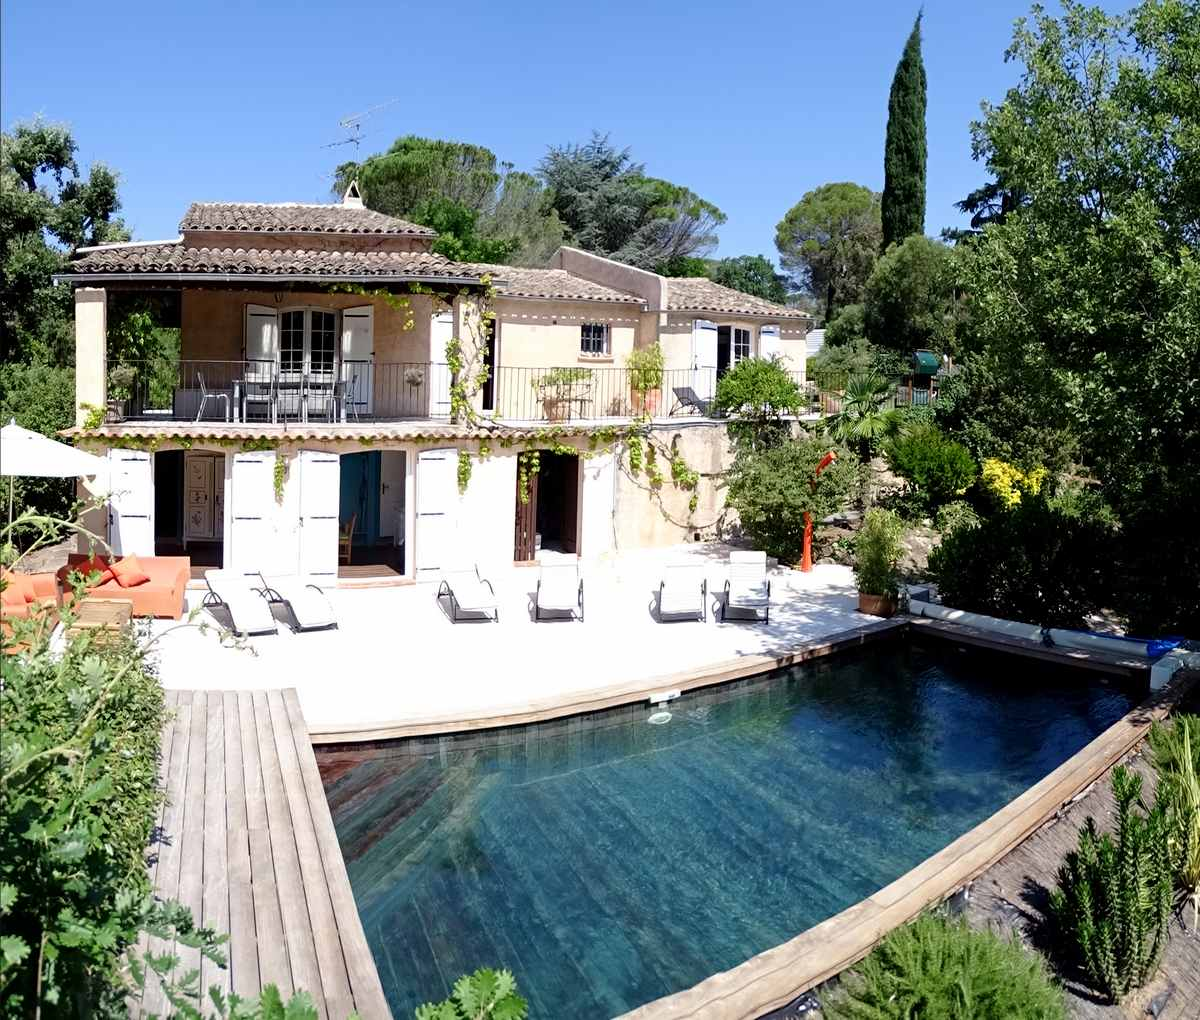 Location vacances bord de mer méditerranée avec piscine